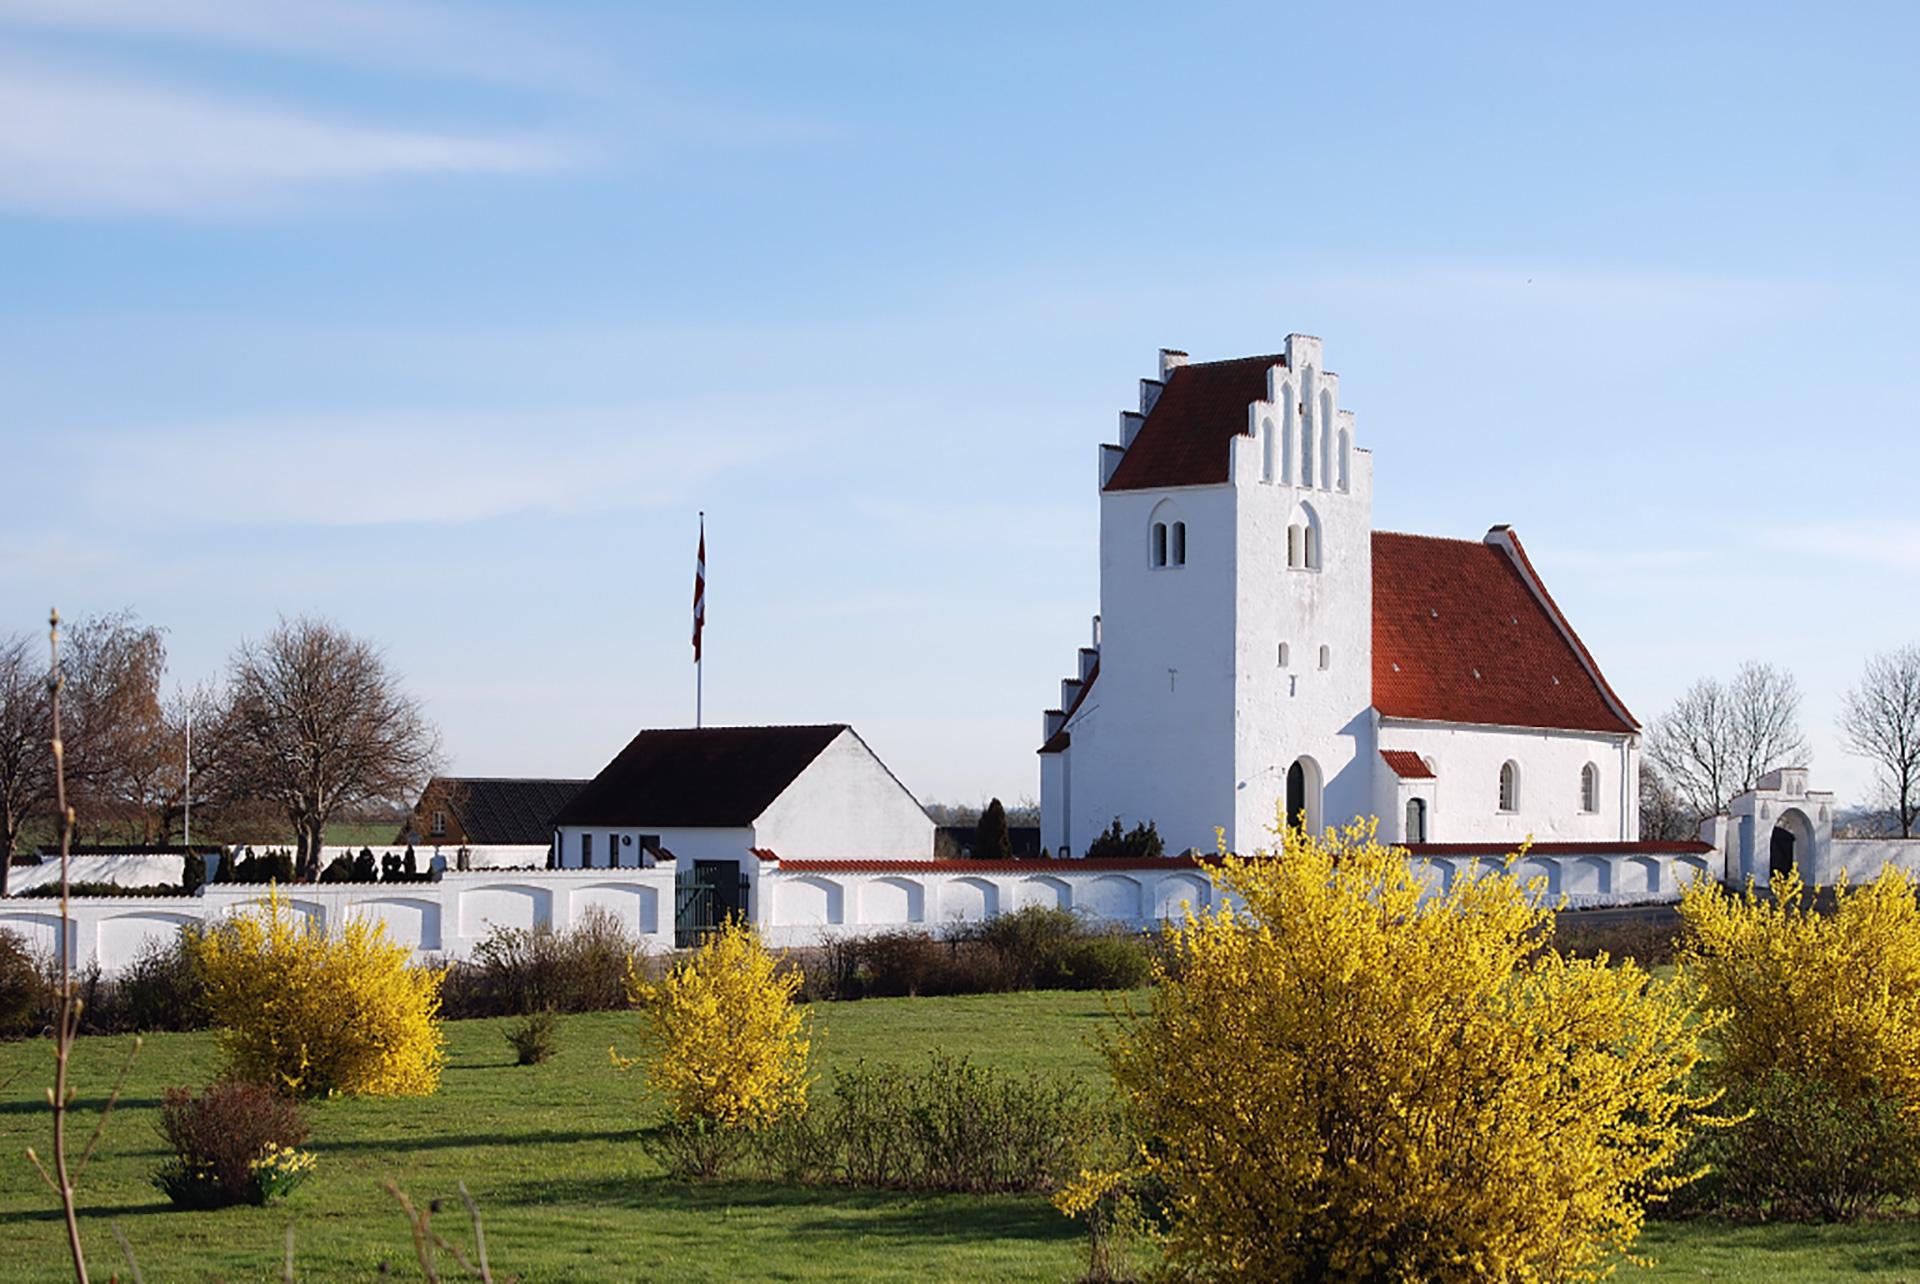 Drøsselbjerg Kirke